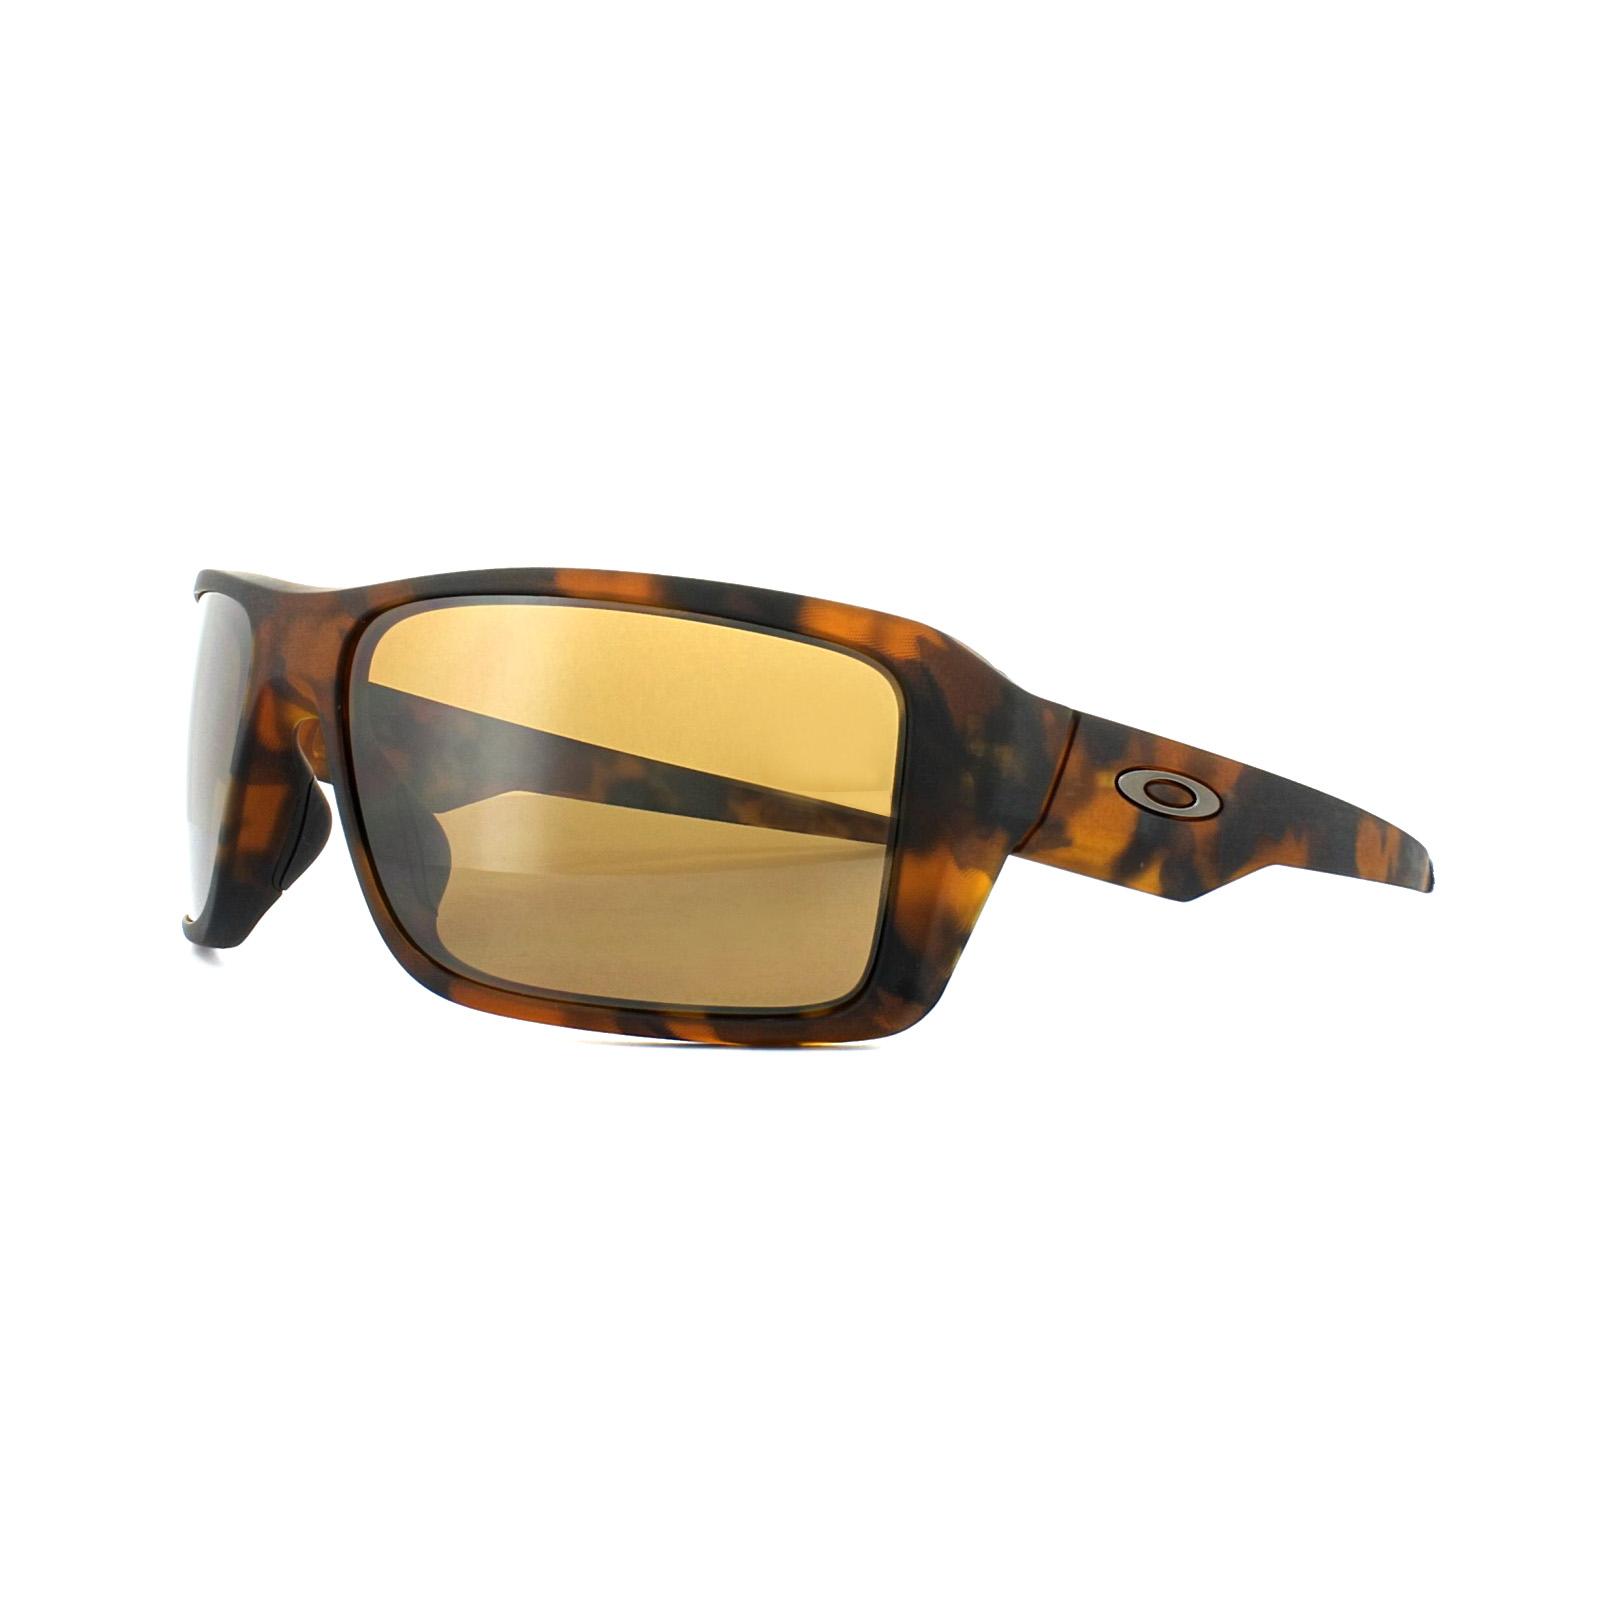 Oakley Double Edge Matte Tortoise/Prizm Tungsten Polarized 2018 Sonnenbrillen CK4oMTe